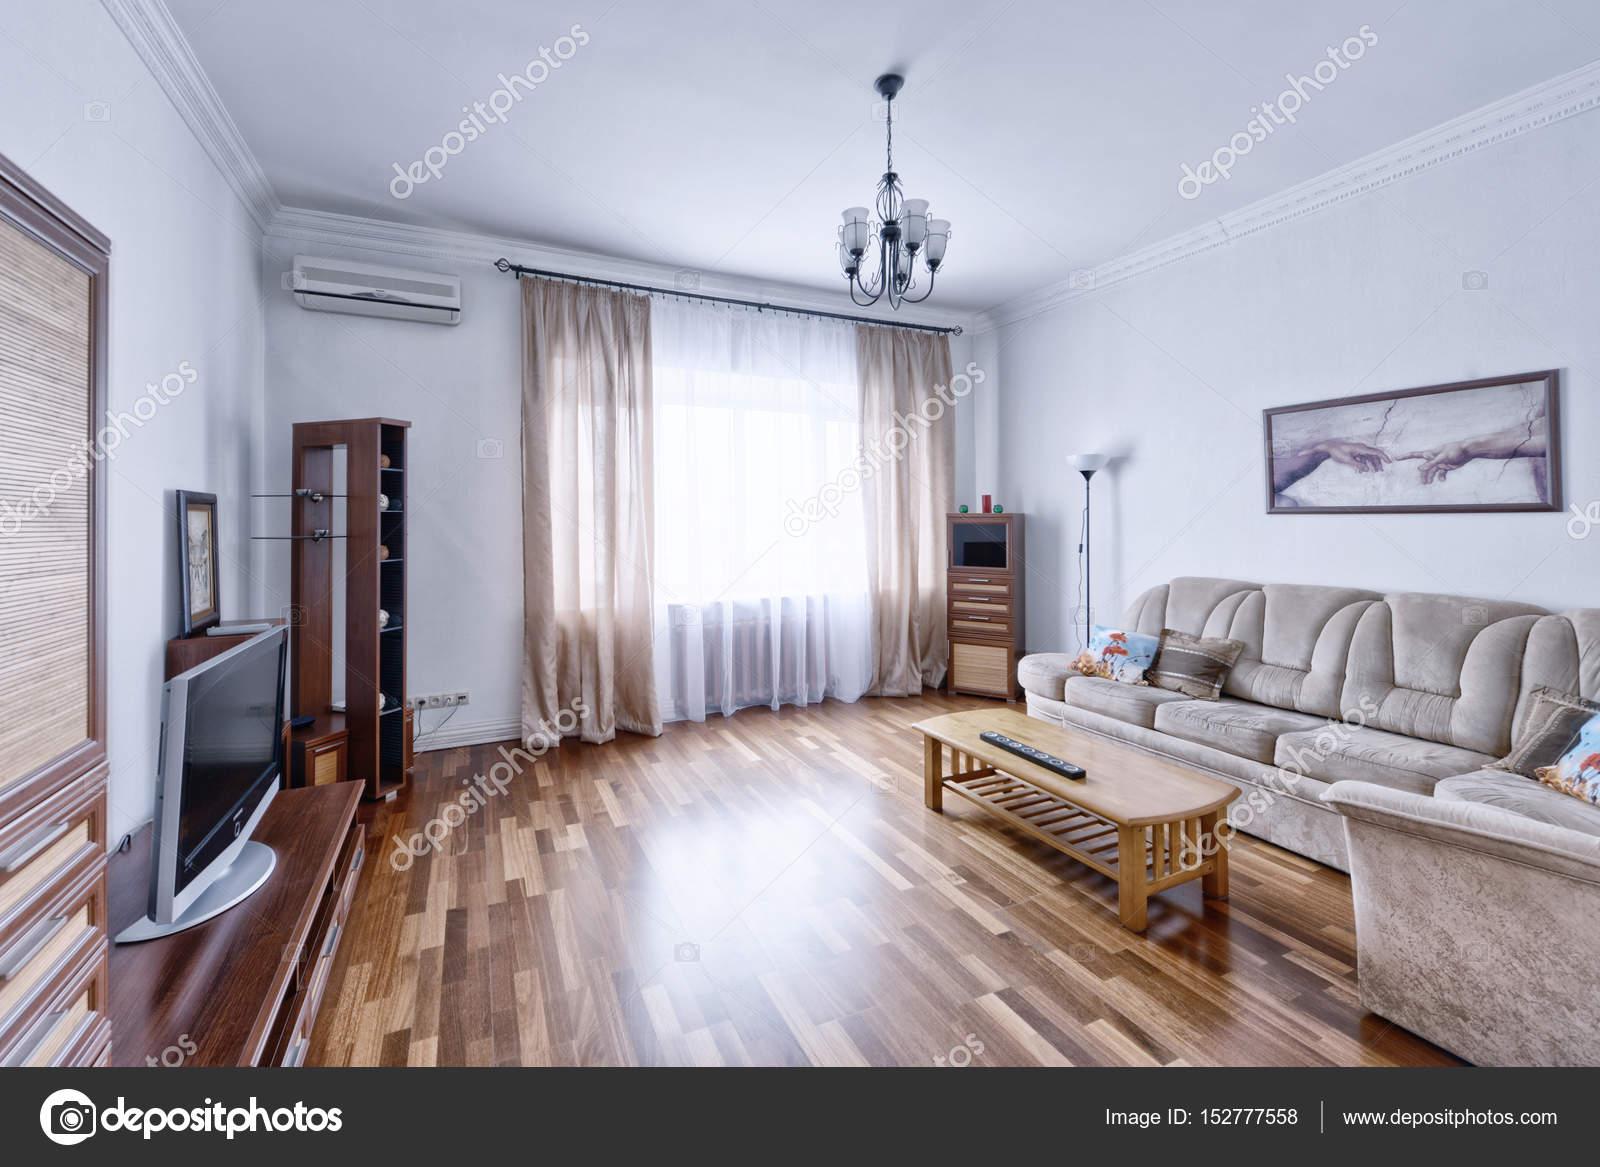 Rusland-Moskou - Modern interieur woonkamer, stedelijk vastgoed ...